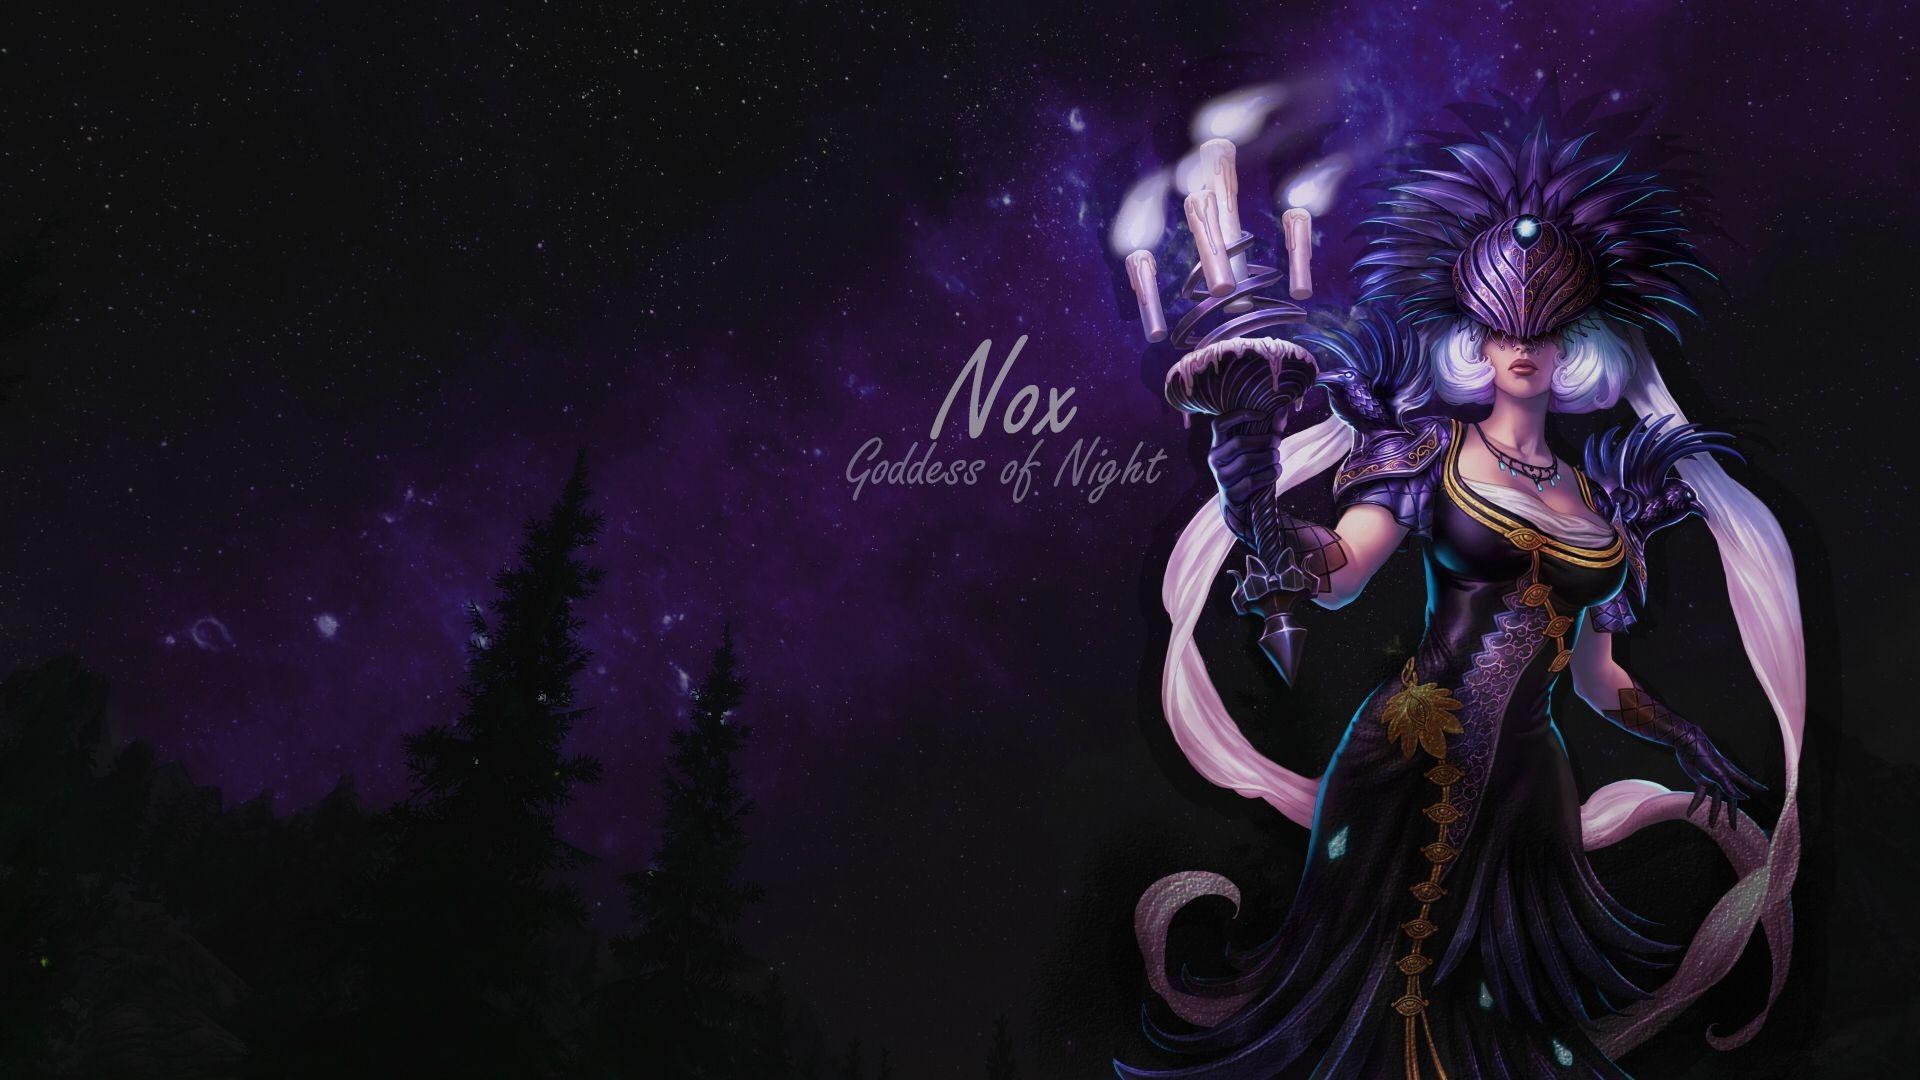 Wallpaper : Smite, mythology, Nox, performance, stage, darkness